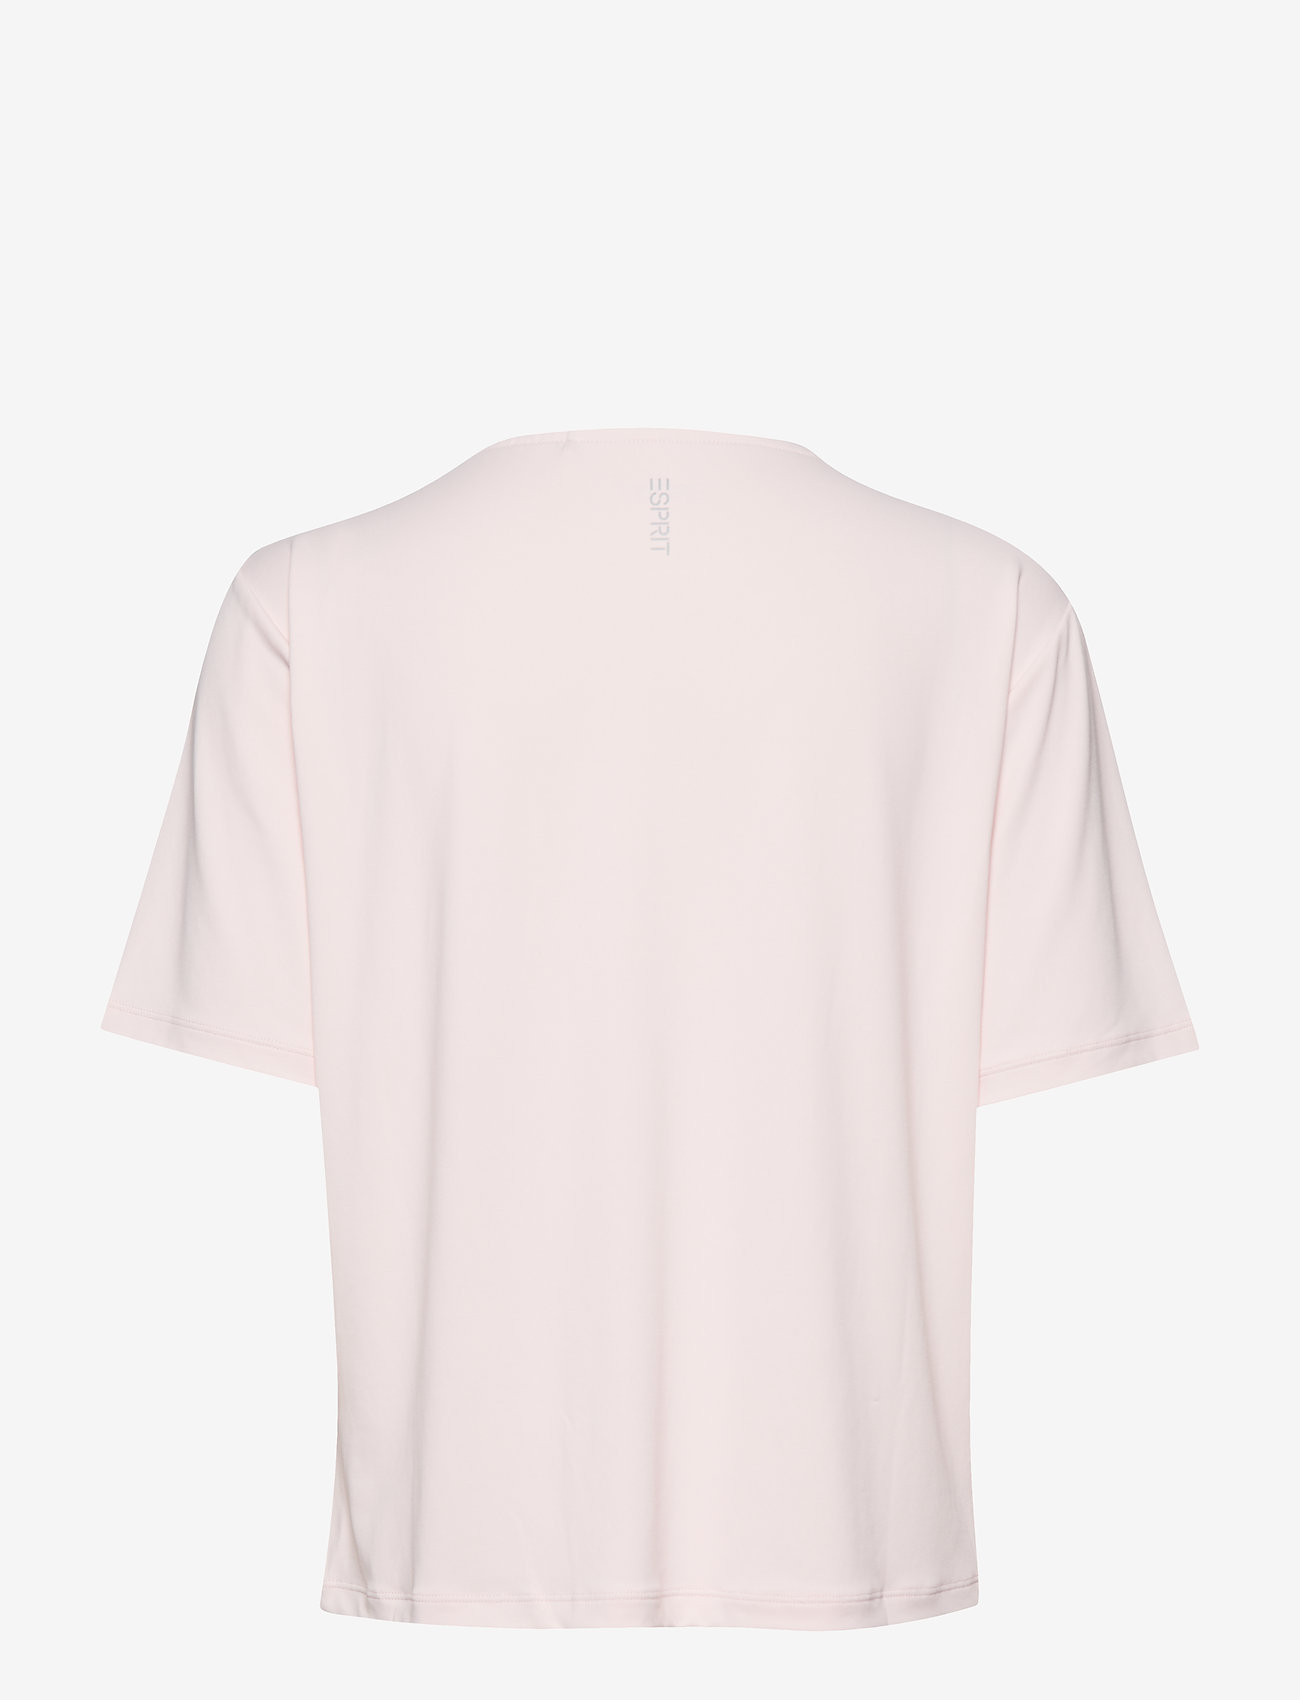 Esprit Sport - T-Shirts - t-shirts - light pink - 1